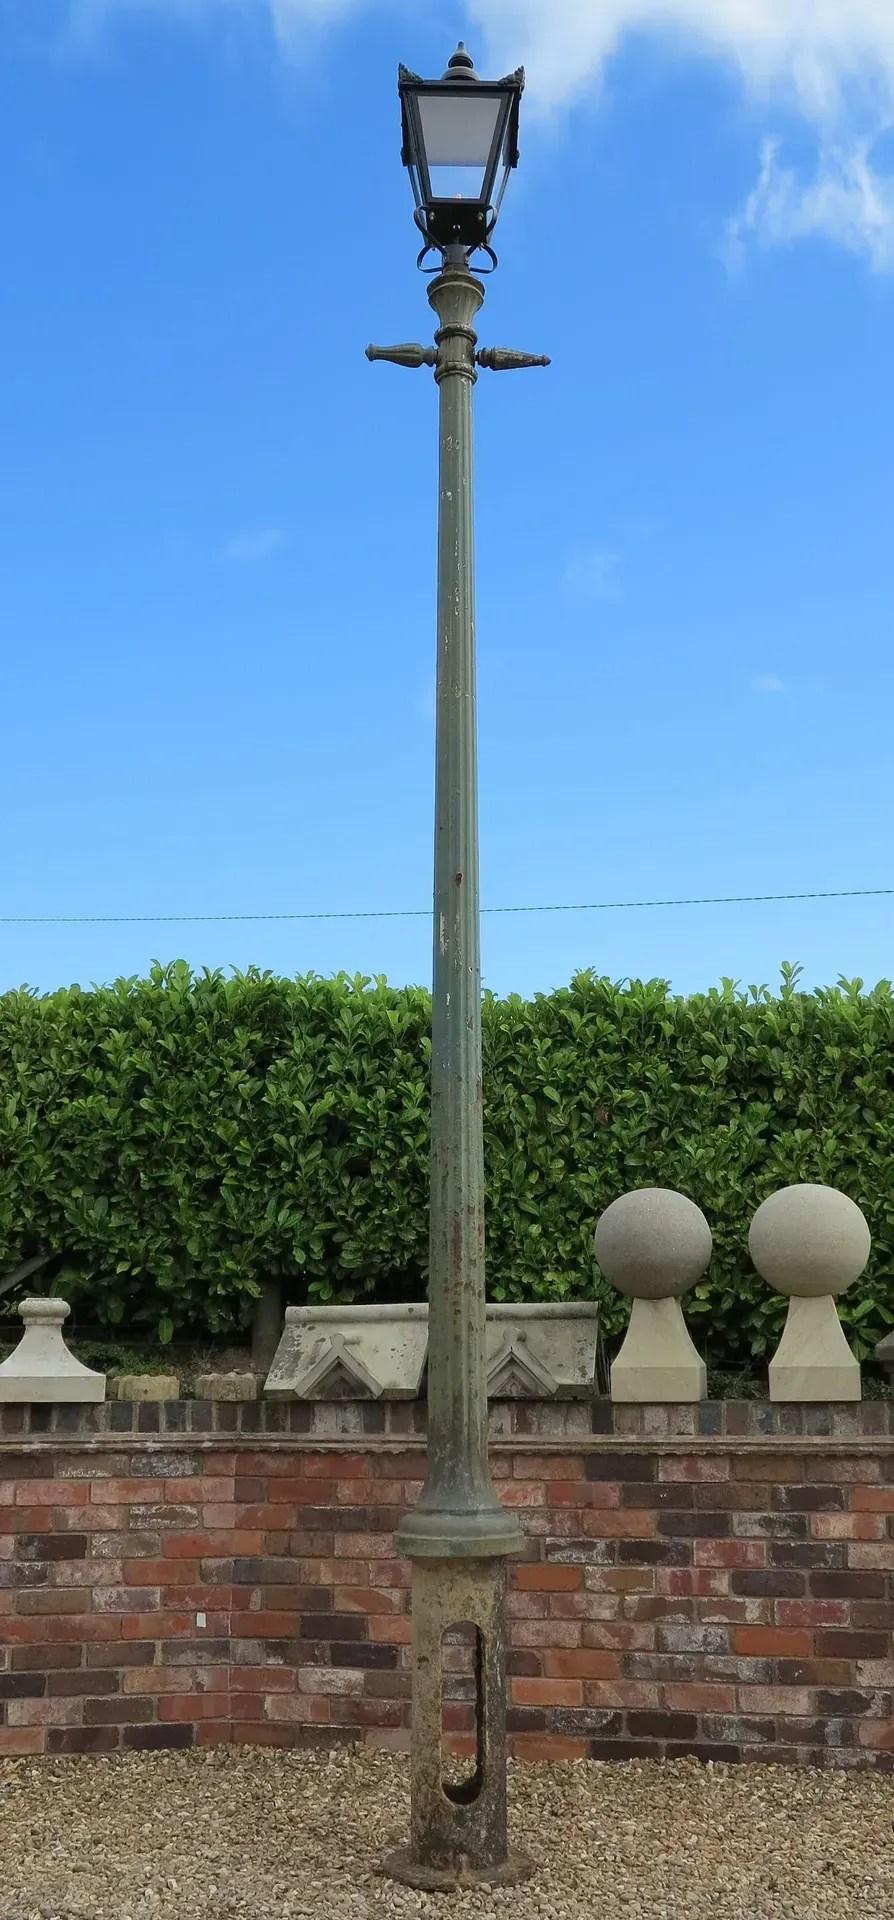 Original Outdoor Reclaimed Cast Iron Street Lamp Lampost